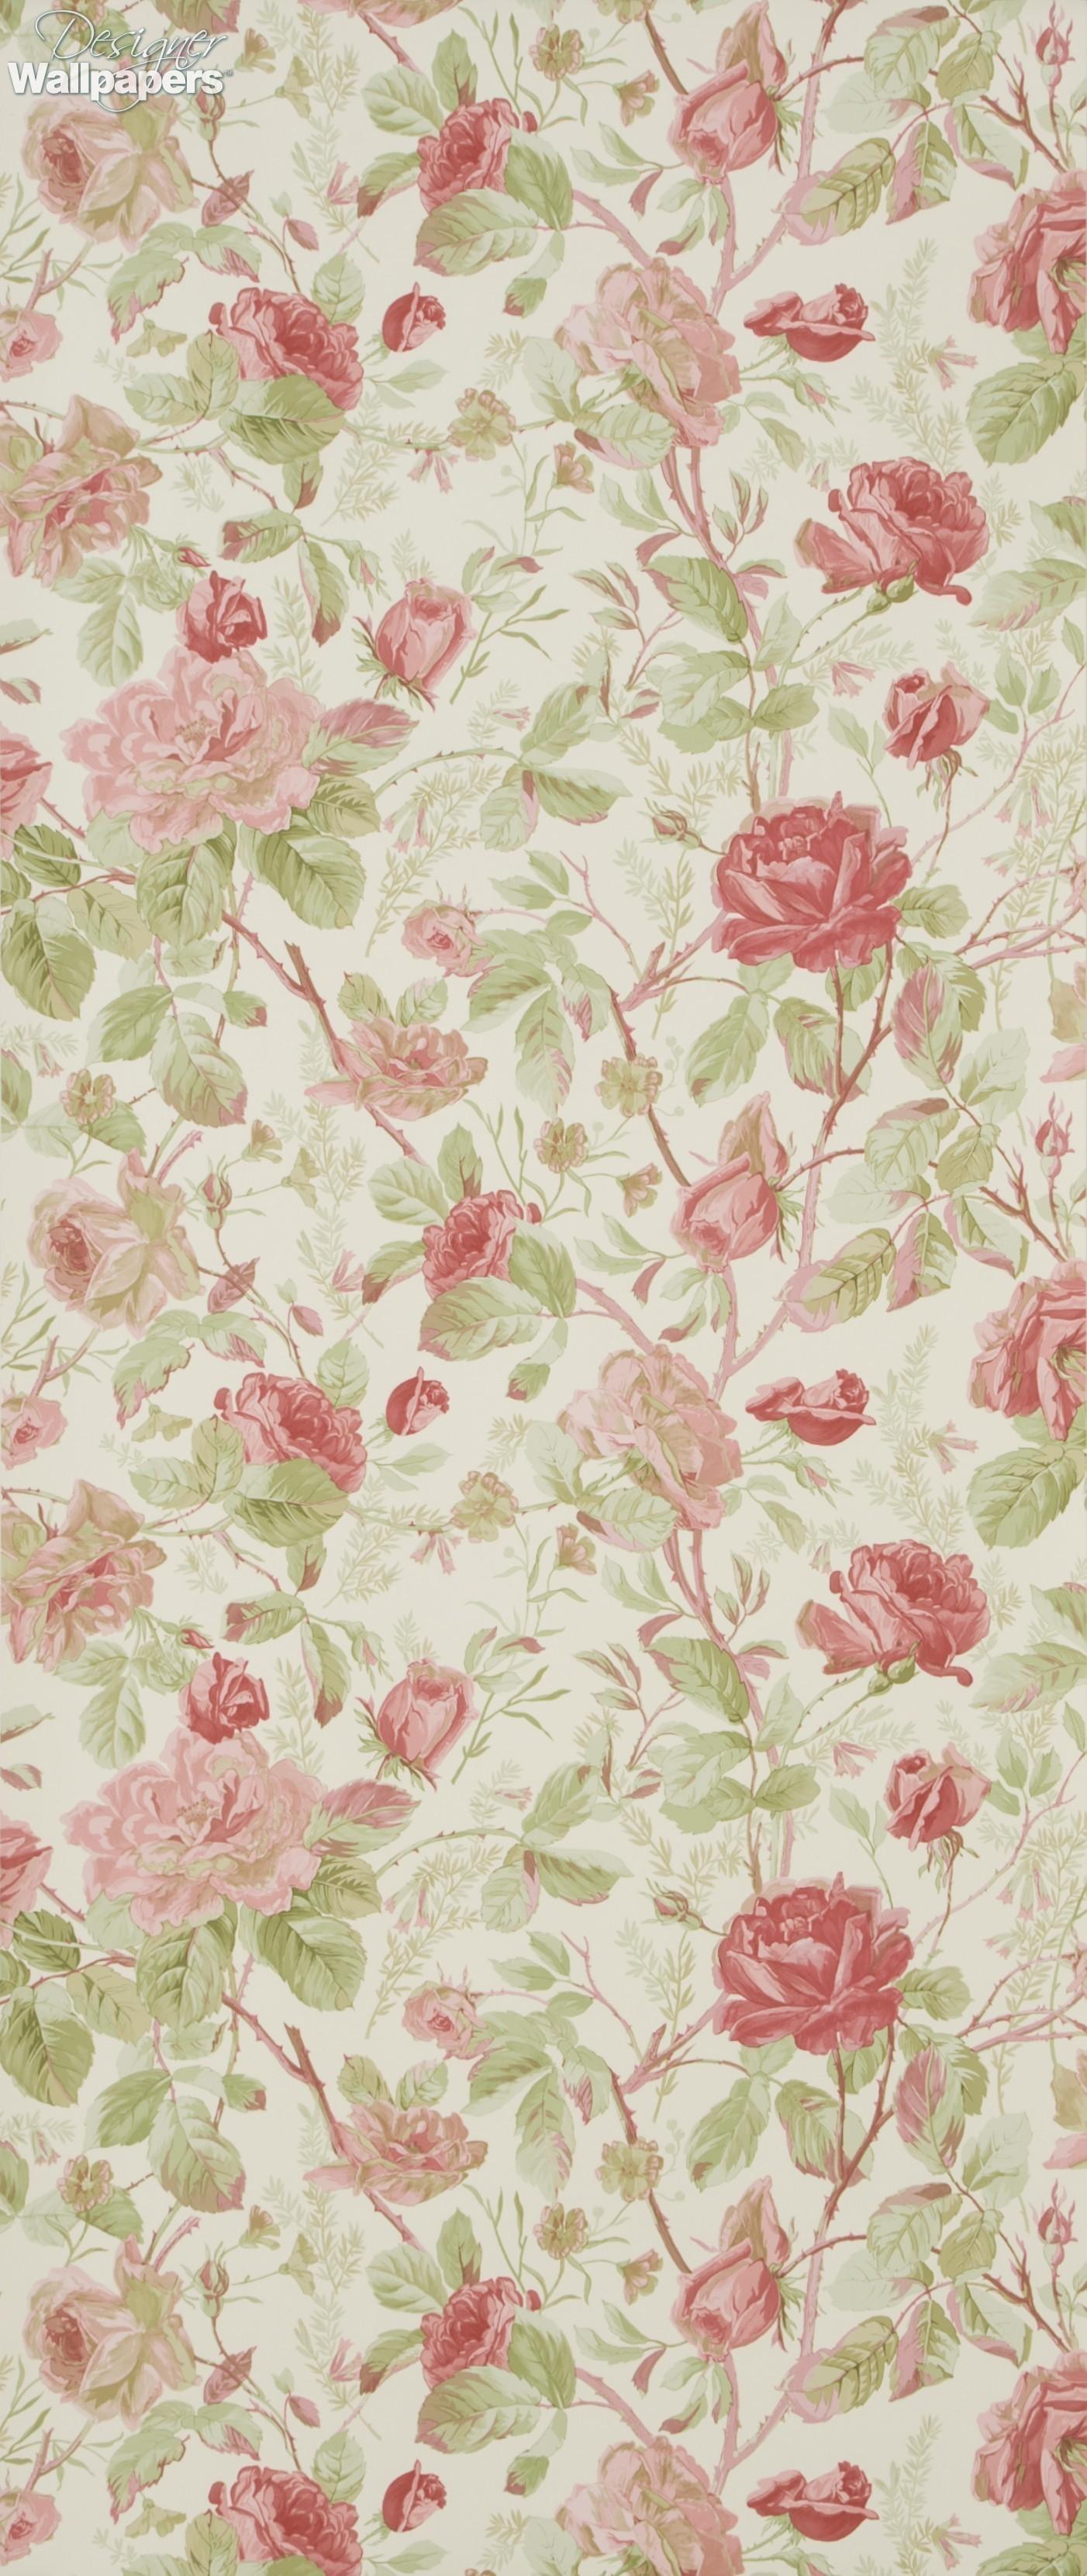 ralph lauren marston gate floral next day delivery. Black Bedroom Furniture Sets. Home Design Ideas